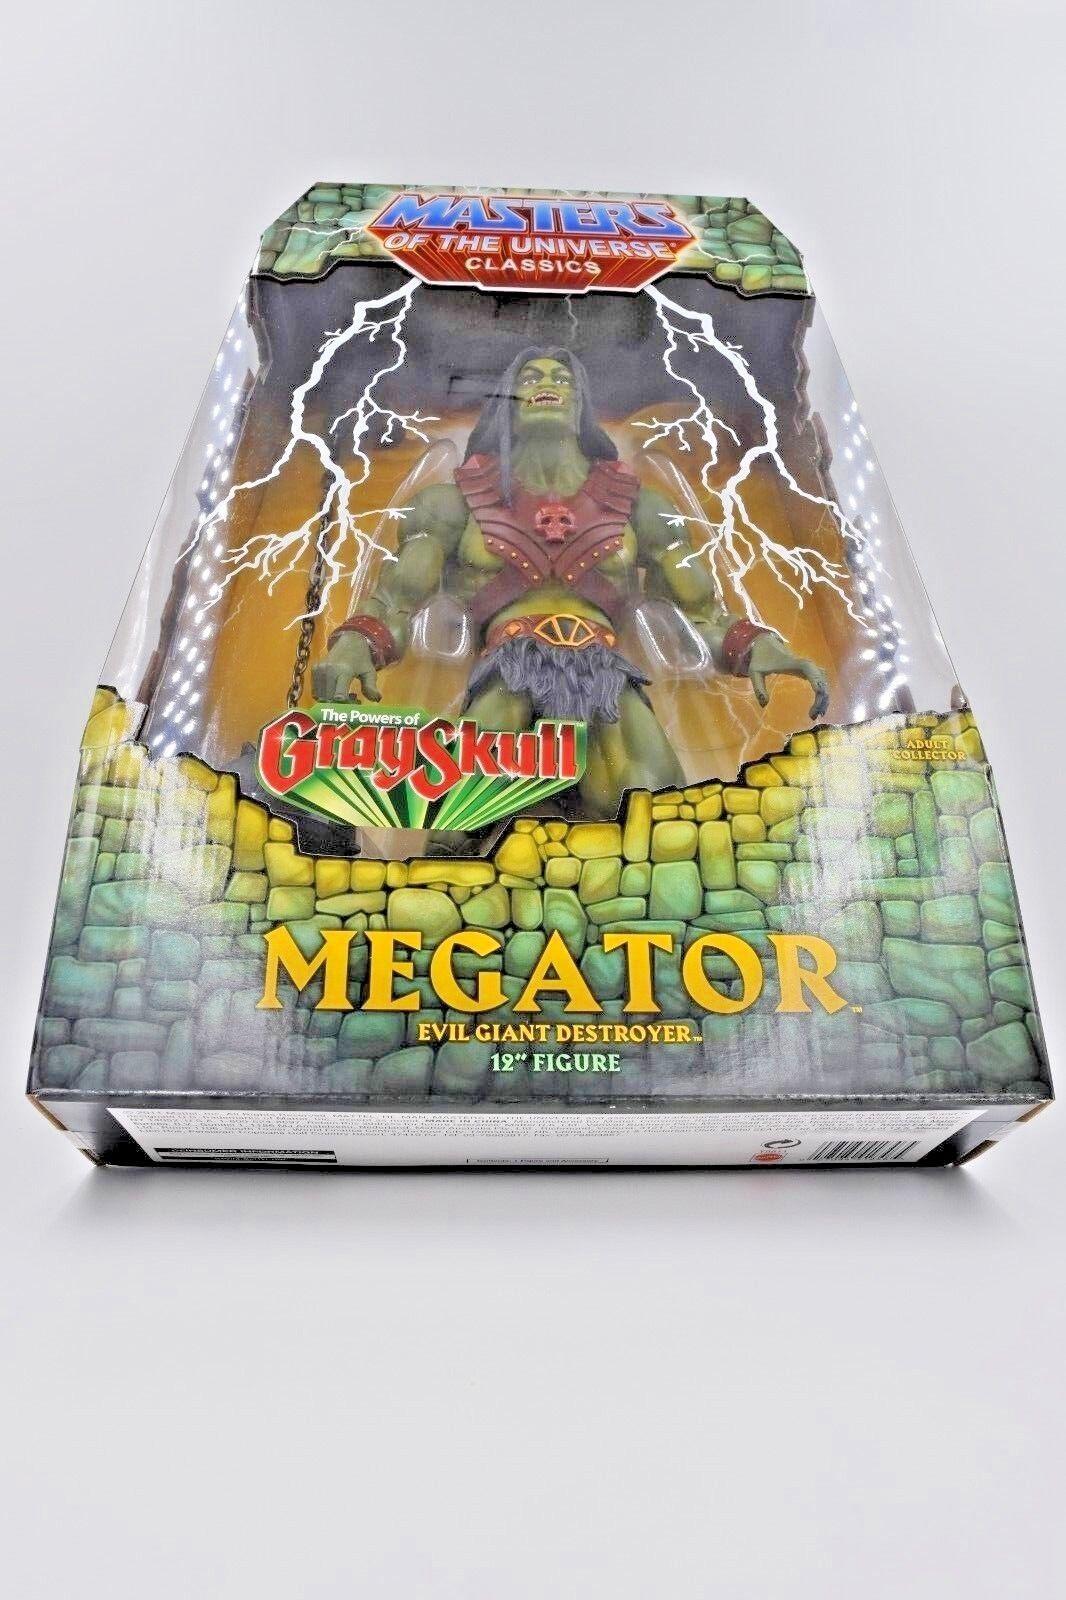 Masters of the Universe Universe Universe Classics Megator MISB with Mailer MOTUC MOTU HeMan SheRa e31090